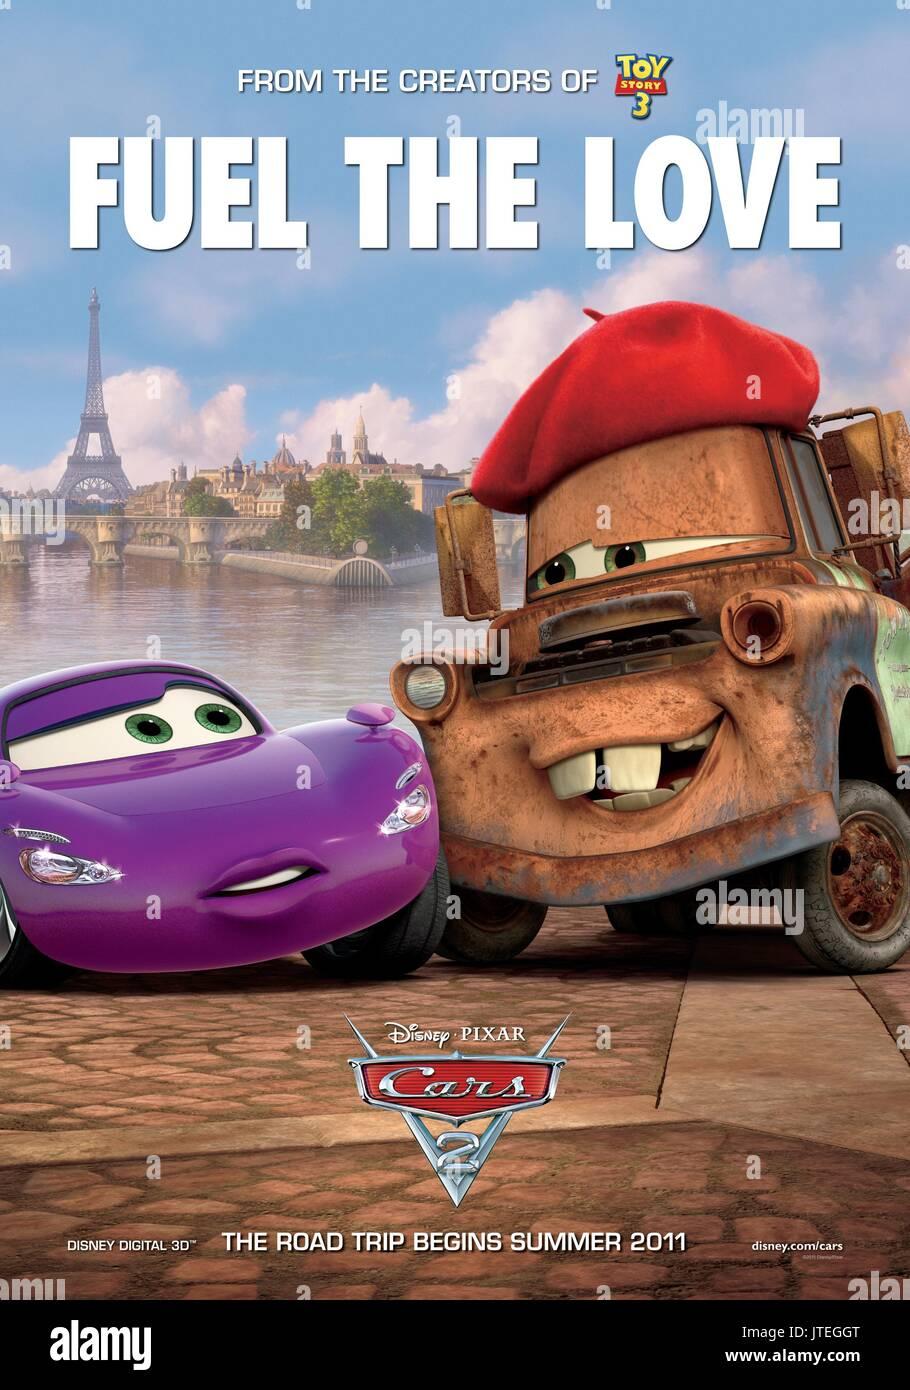 Movie Poster Cars 2 2011 Stock Photo Alamy